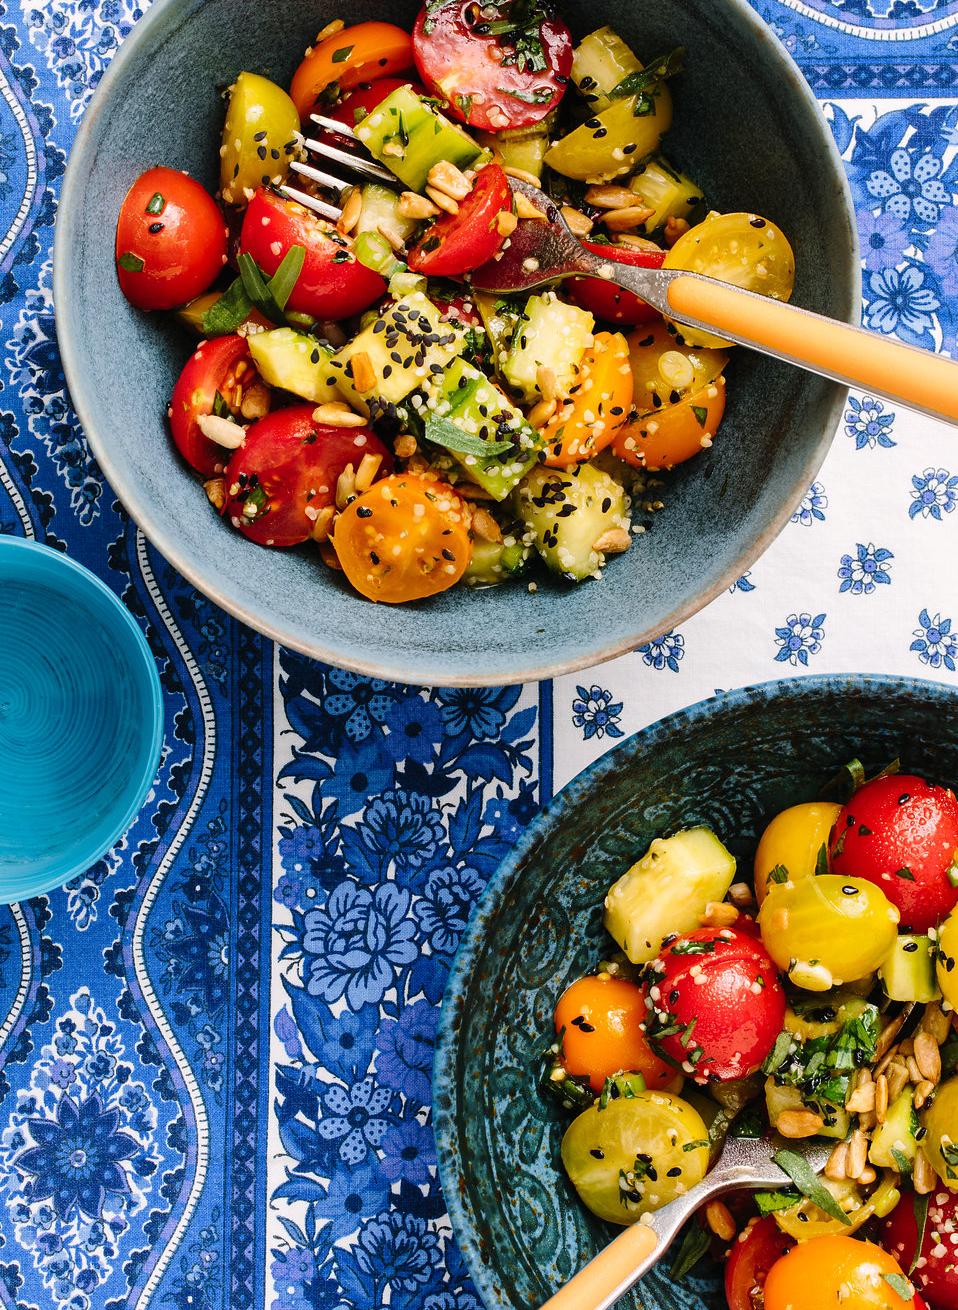 gff_tomato_salad.jpg